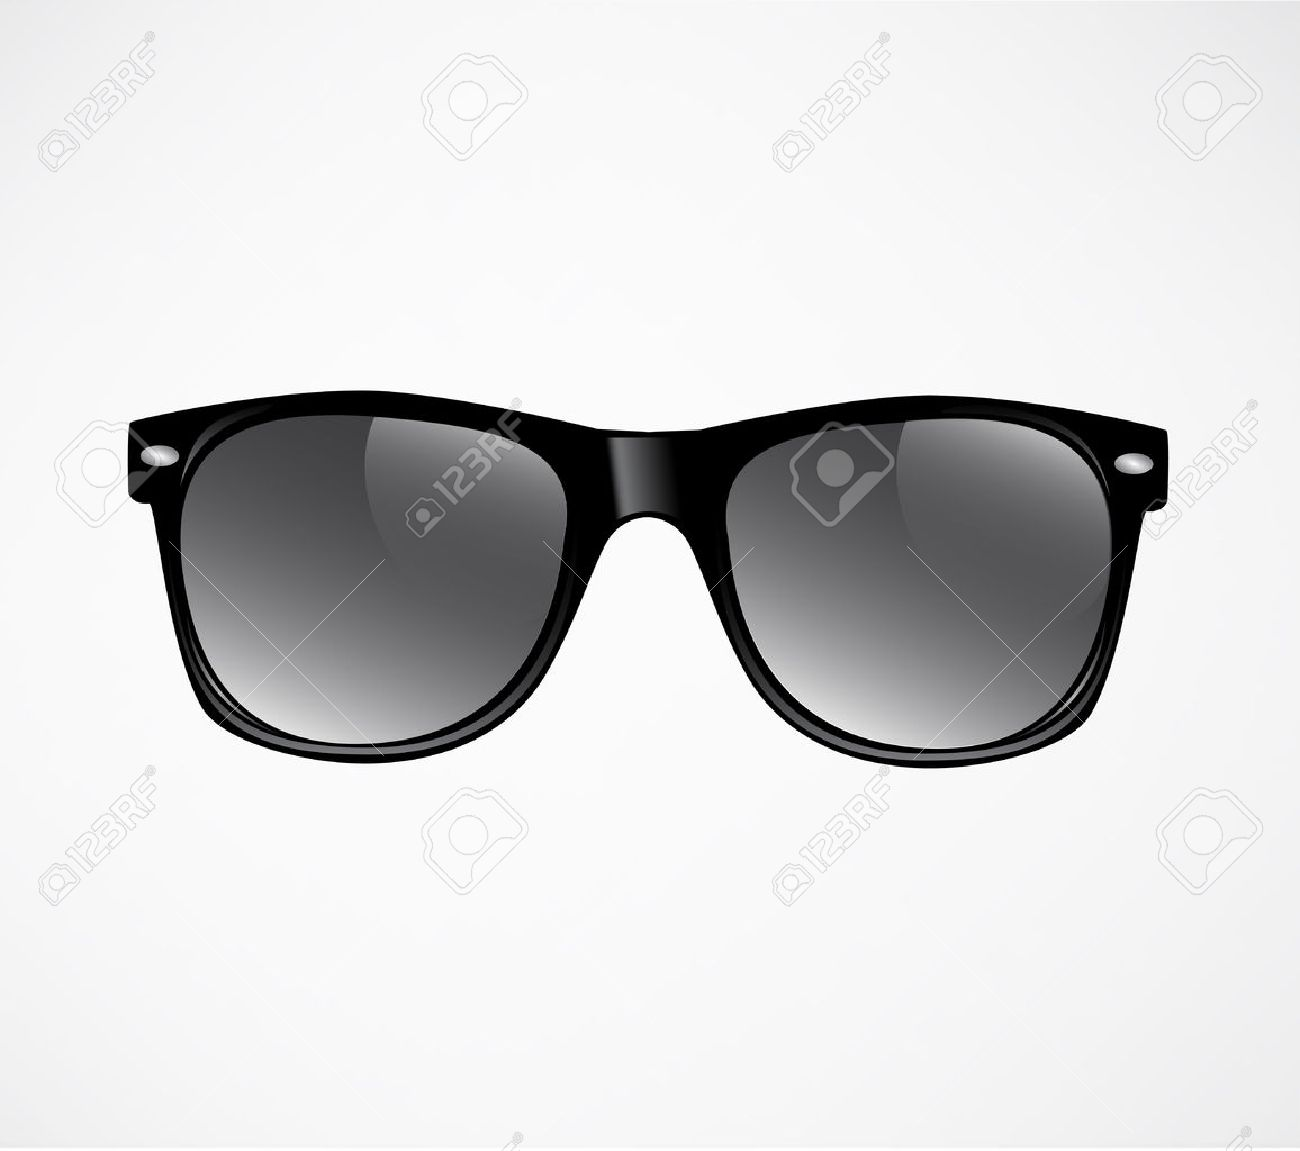 Sunglasses vector illustration background - 29685179